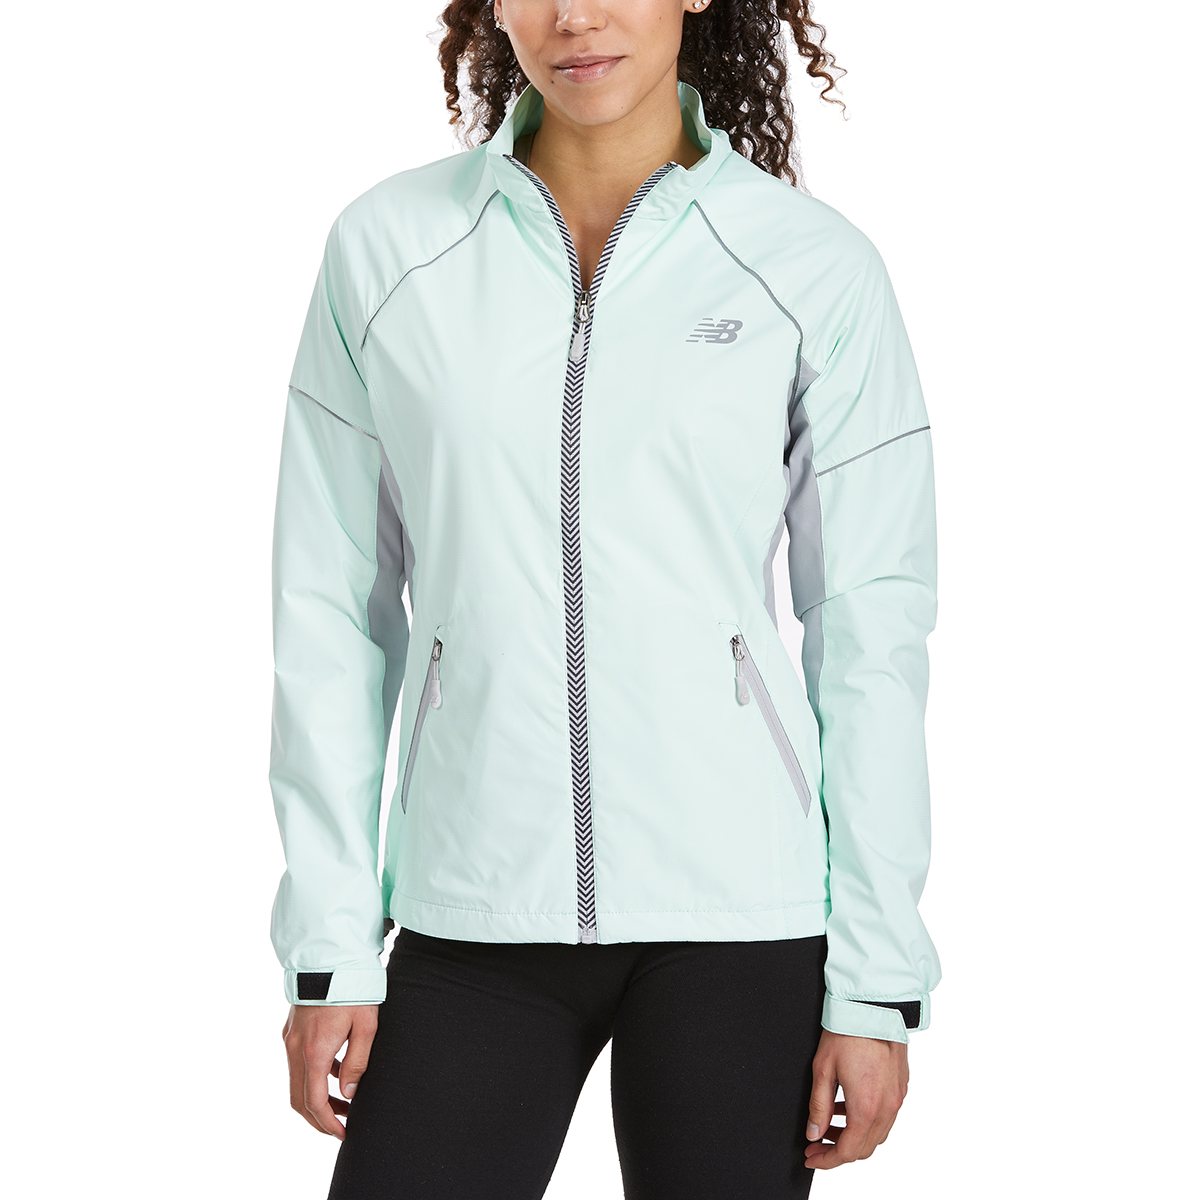 New Balance Women's Poly Dobby Mock Neck Jacket - Green, L